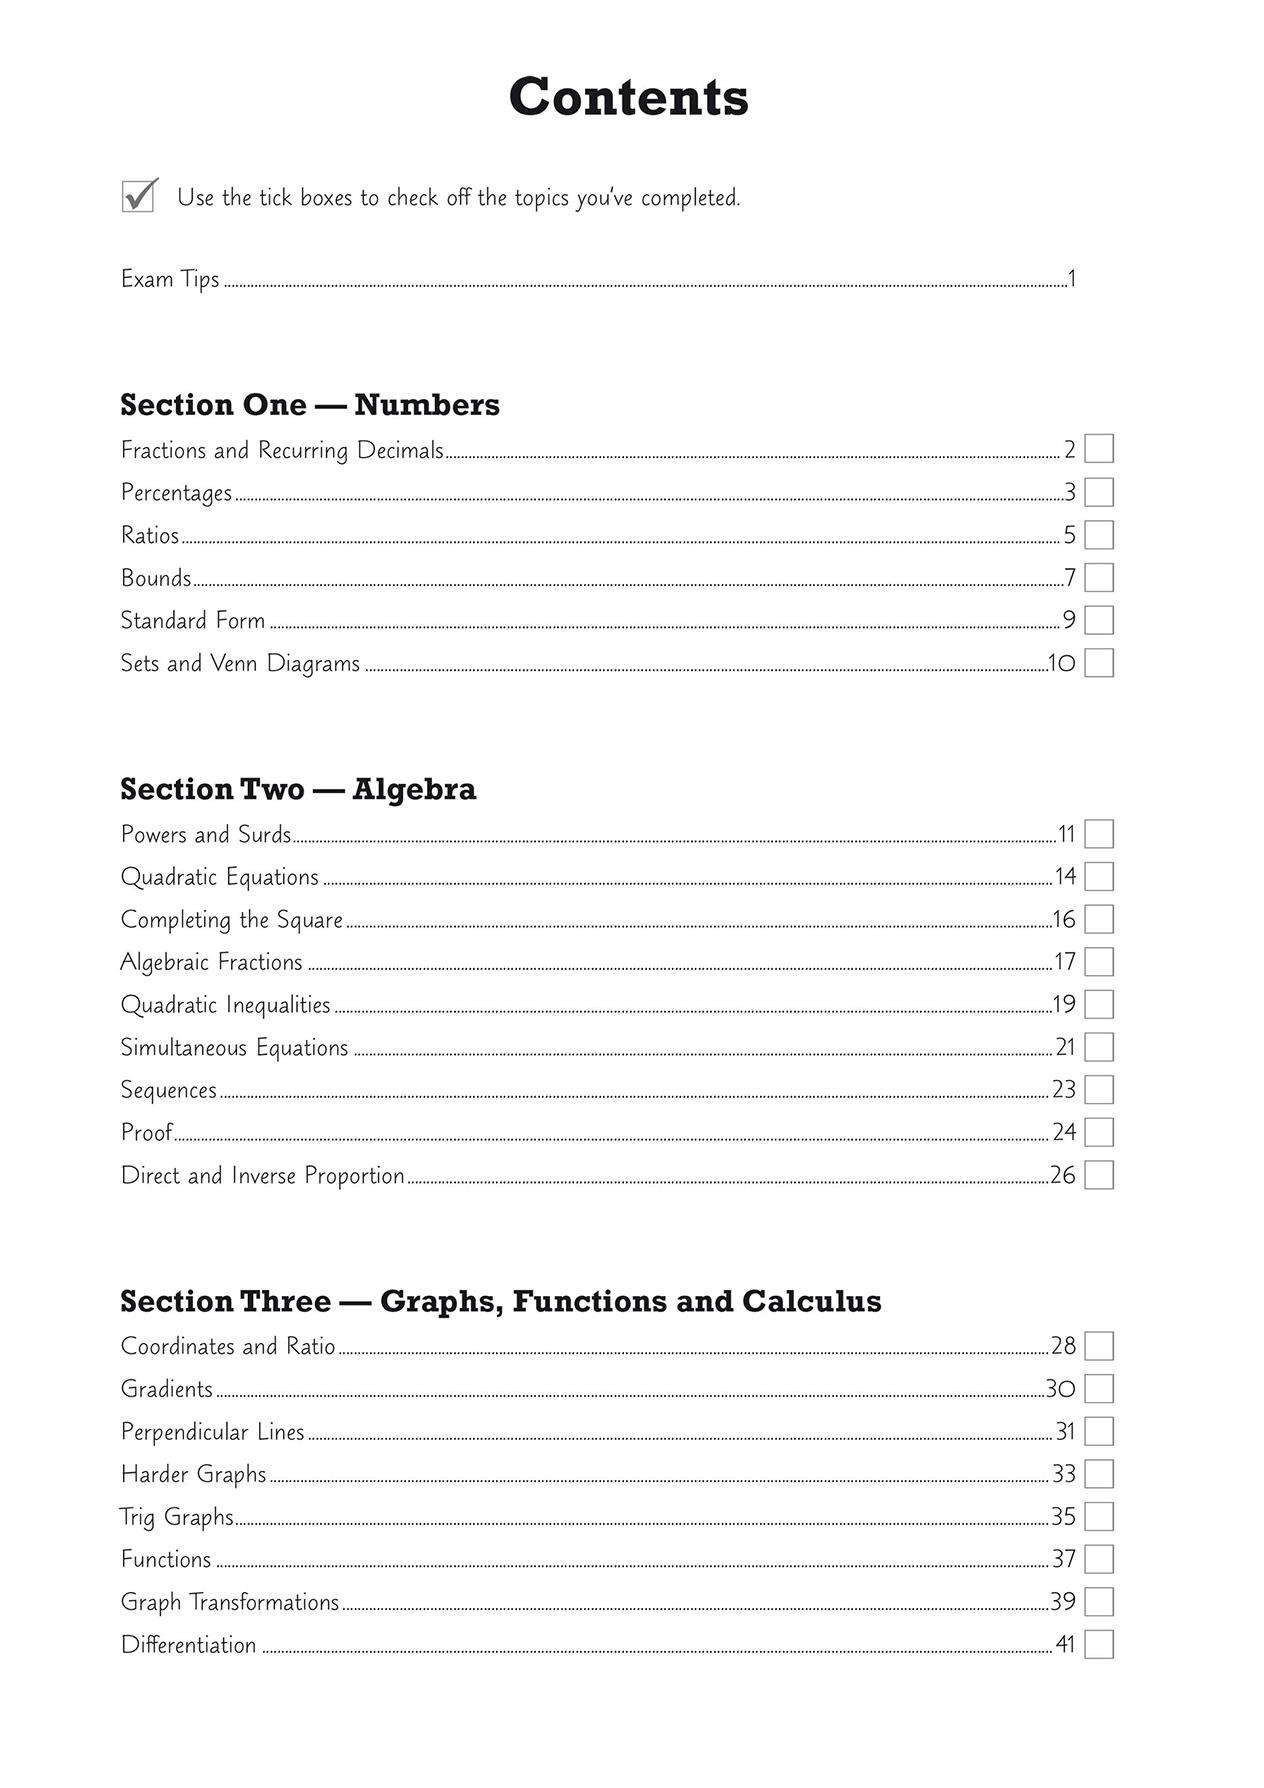 ME9QI41 - New Edexcel International GCSE Maths Grade 8-9 Targeted Exam  Practice Workbook (includes A